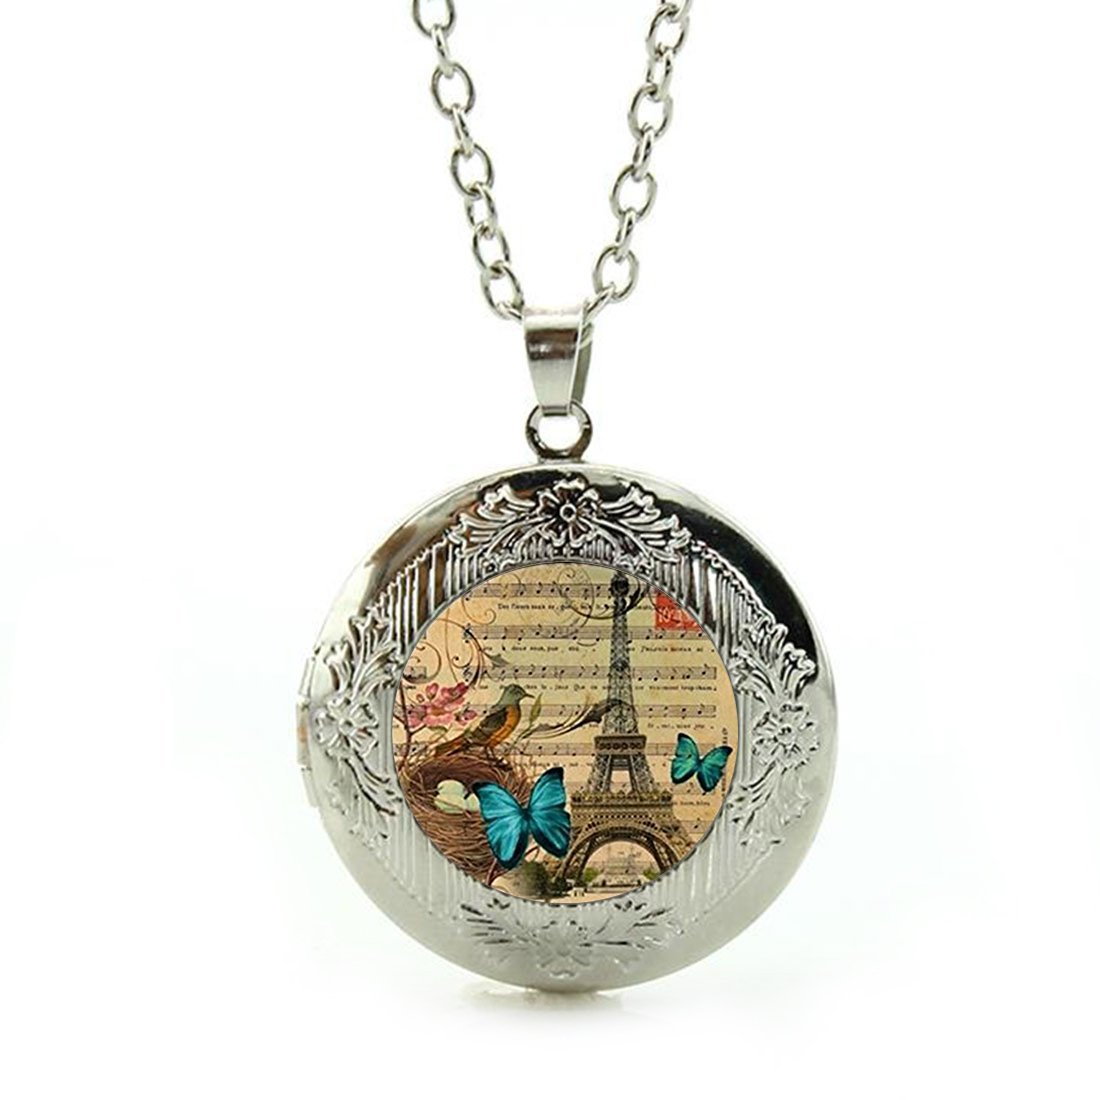 Women's Custom Locket Closure Pendant Necklace Vintage Butterfly Paris Eiffel Included Free Silver Chain, Best Gift Set